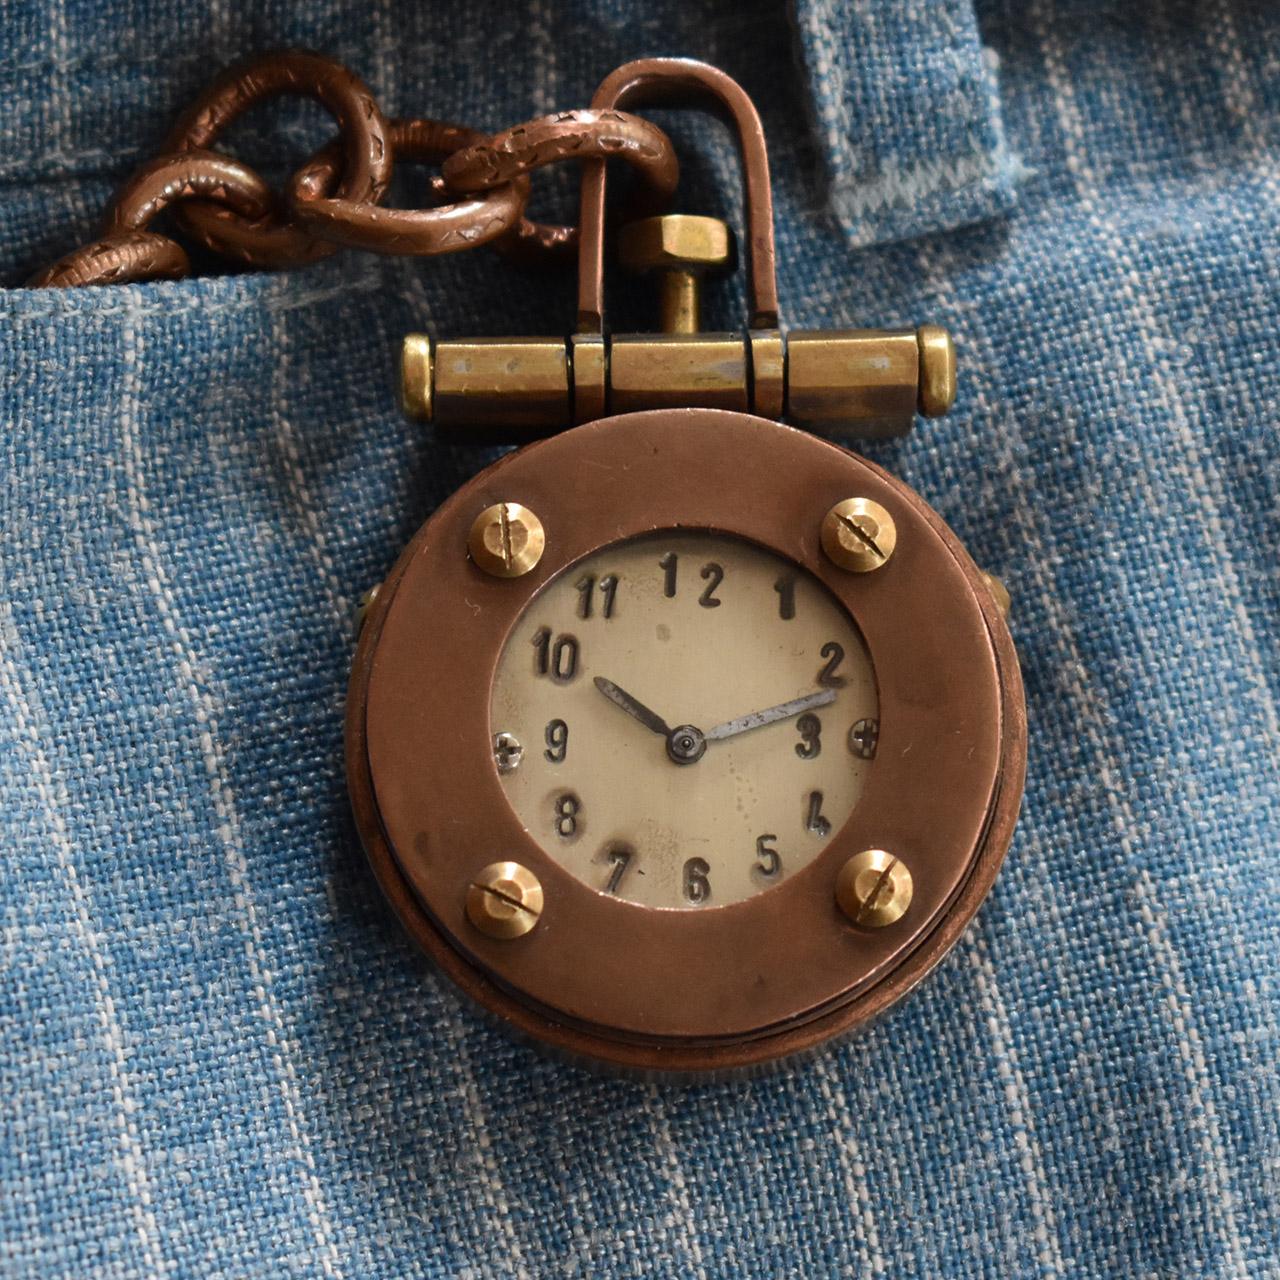 Armbanduhr anfertigen lassen - Atelier Horloges - Taschenuhr - Kupferkessel